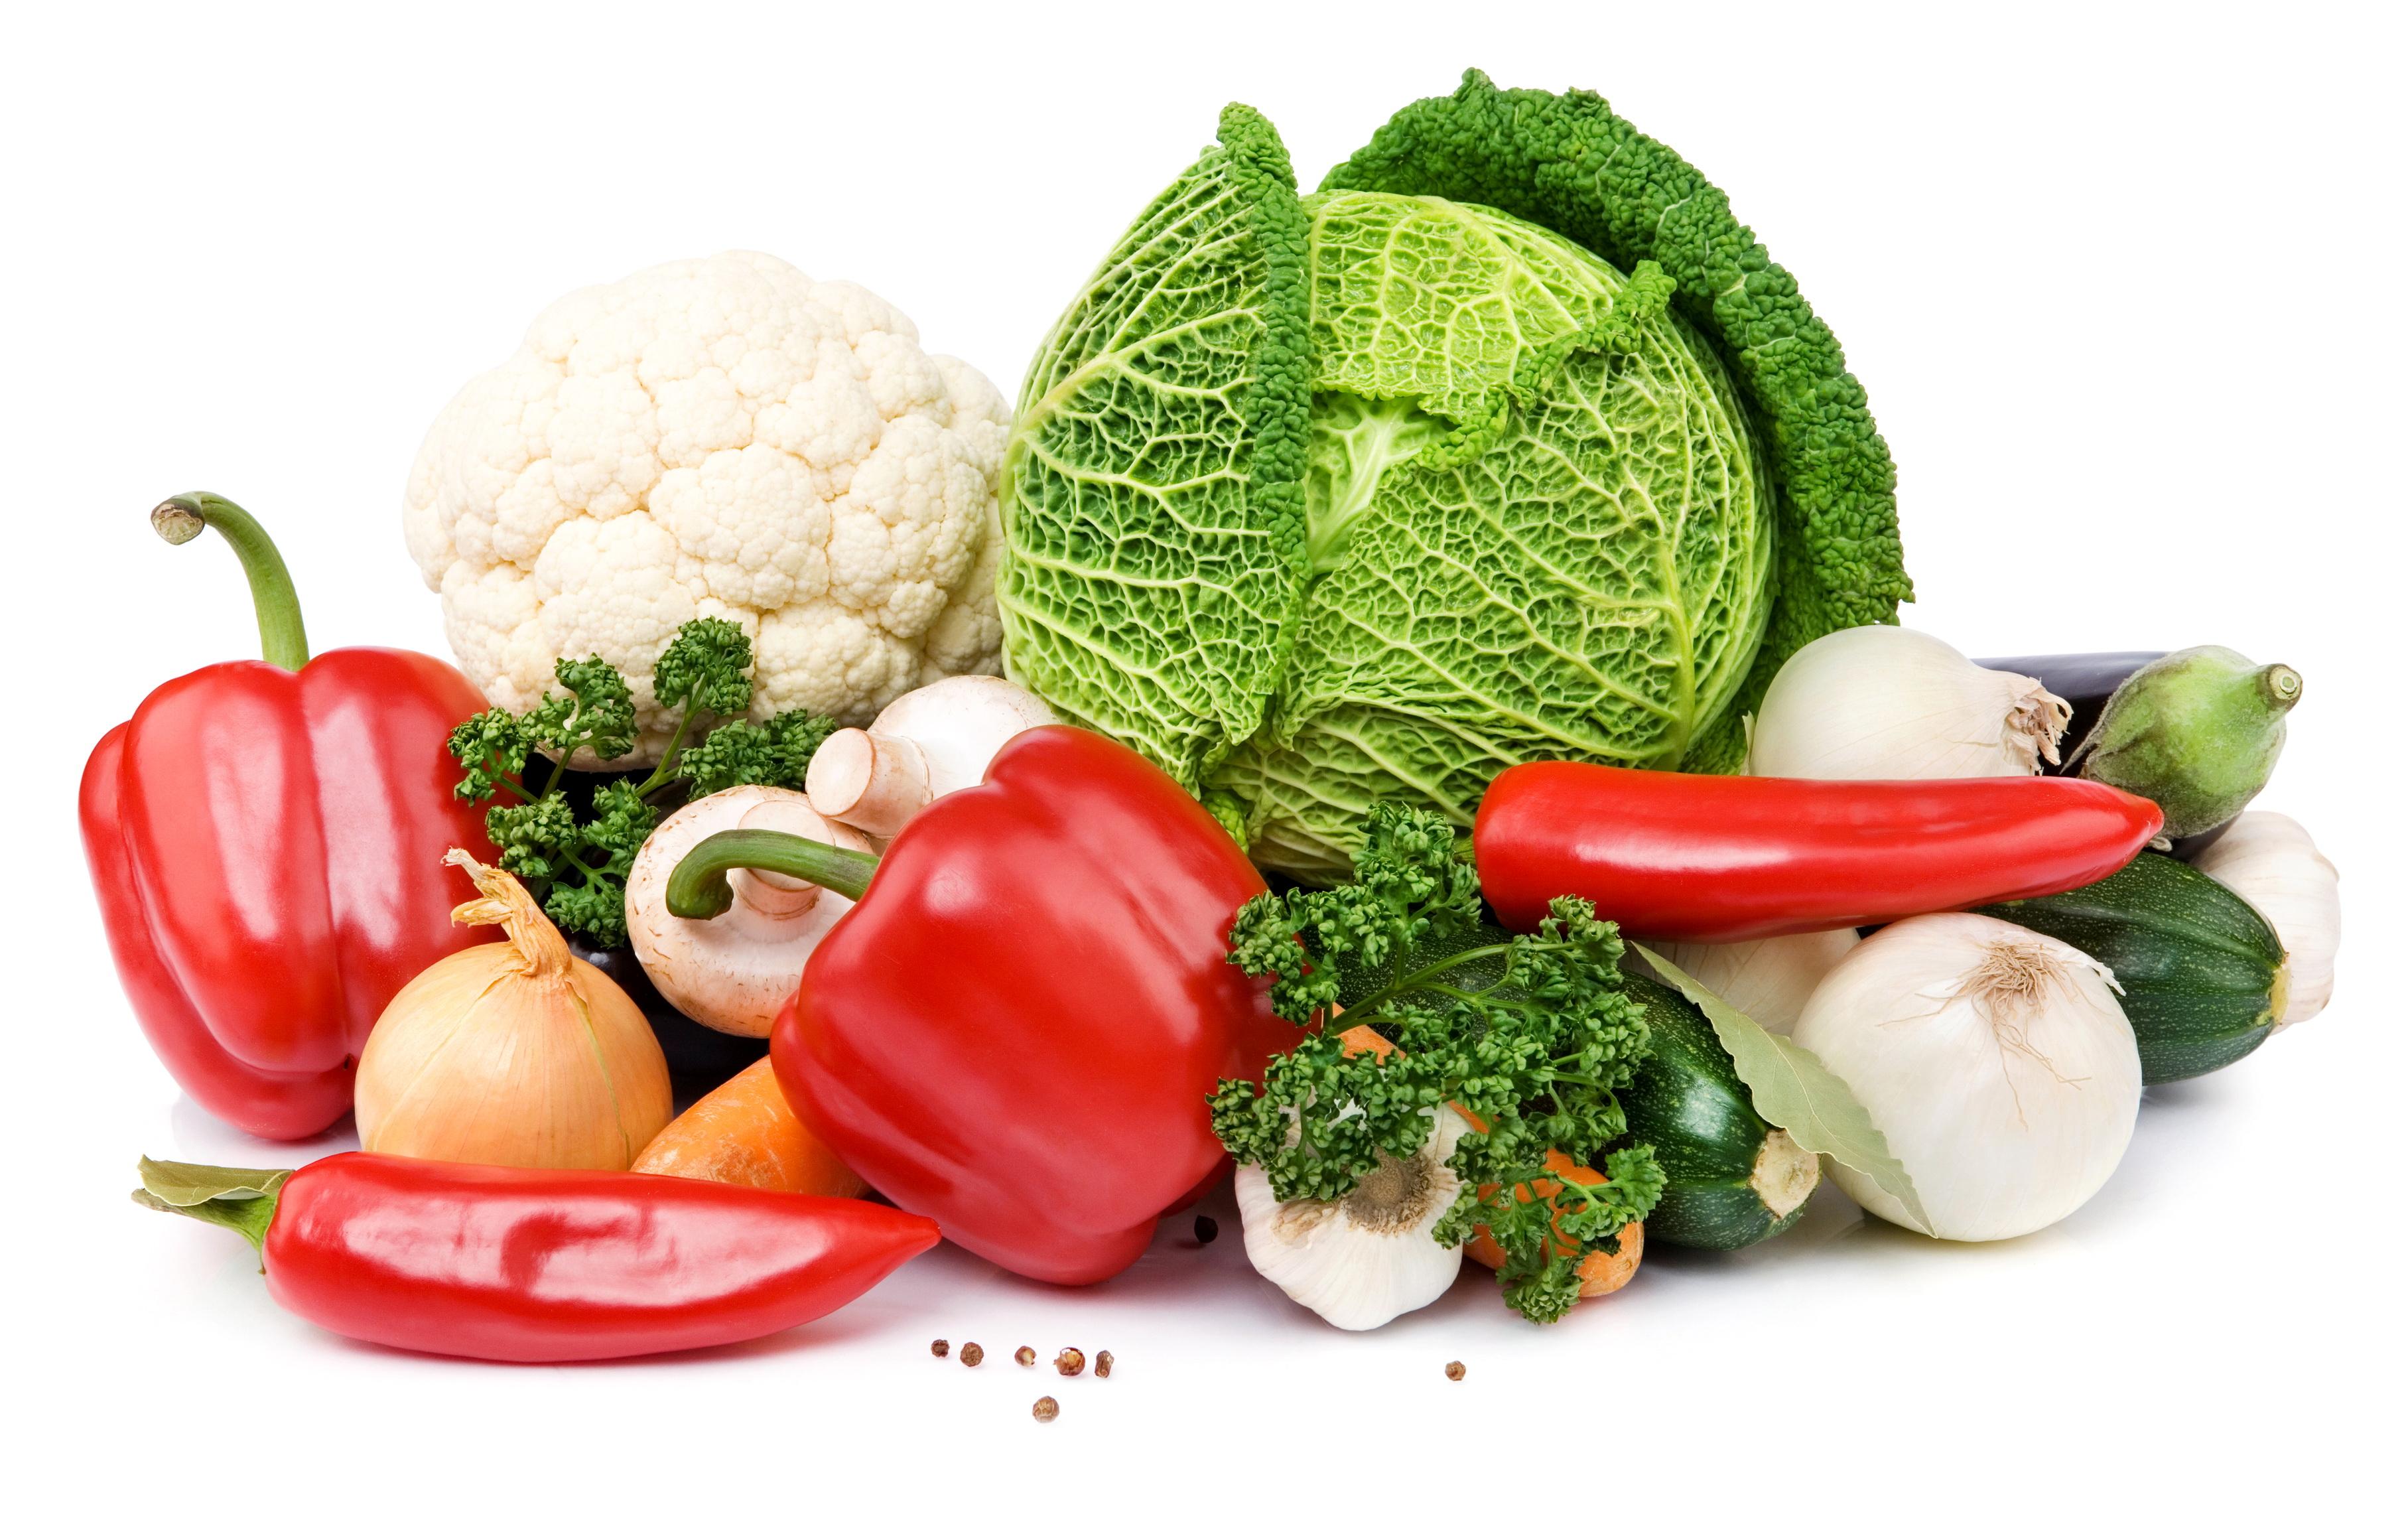 200 Vegetables HD Wallpapers | Backgrounds - Wallpaper ...